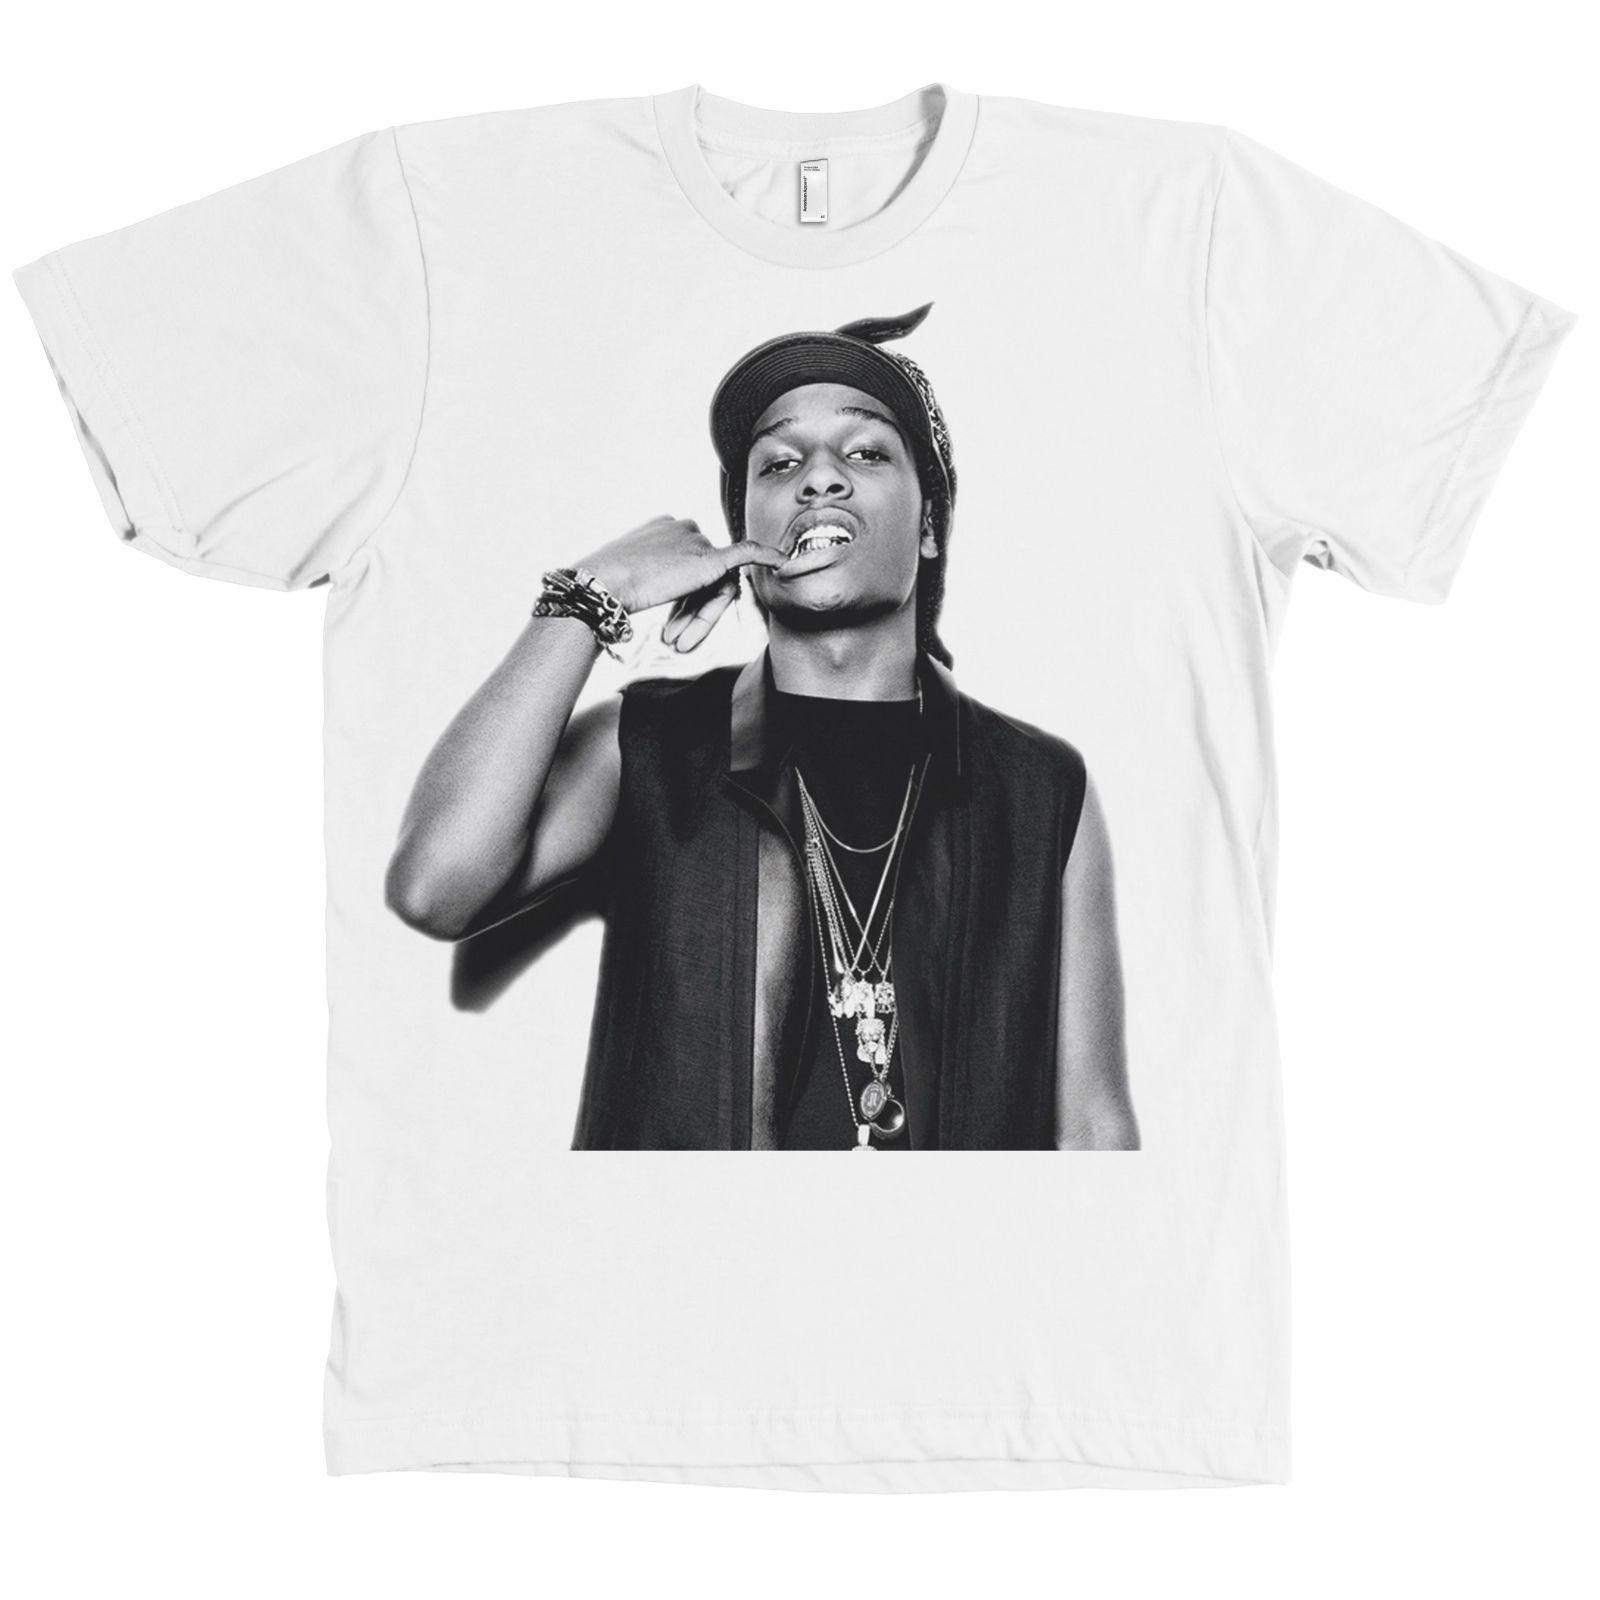 ASAP ROCKY T-Shirt A$AP Savage Hip Hop Rap Urban Streetwear Tee New